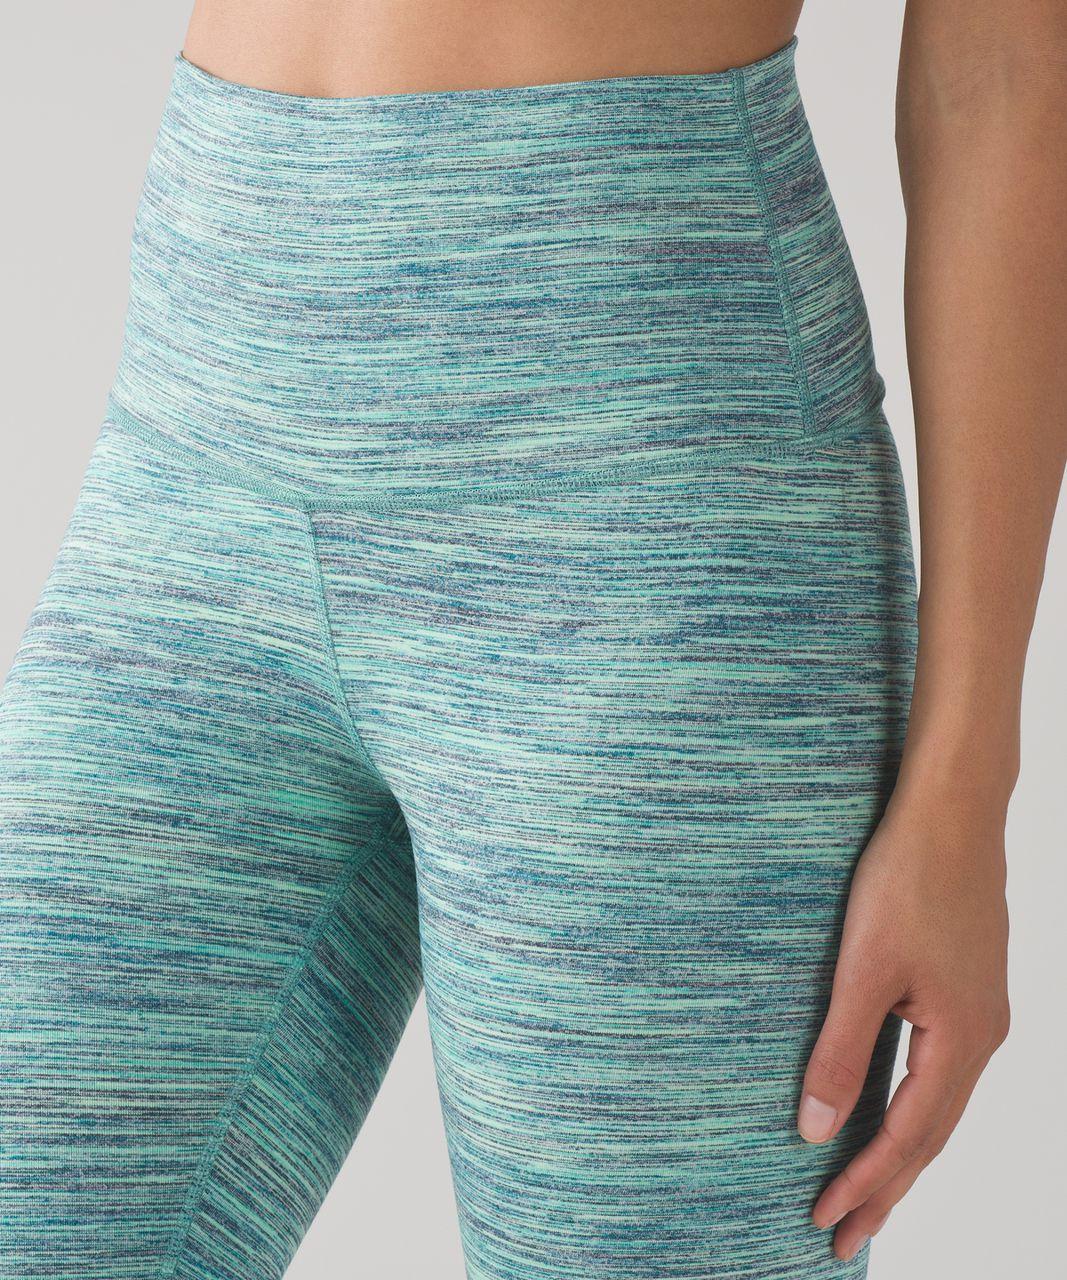 Lululemon Wunder Under Pant (Hi-Rise) - Space Dye Camo Alberta Lake Fresh Teal